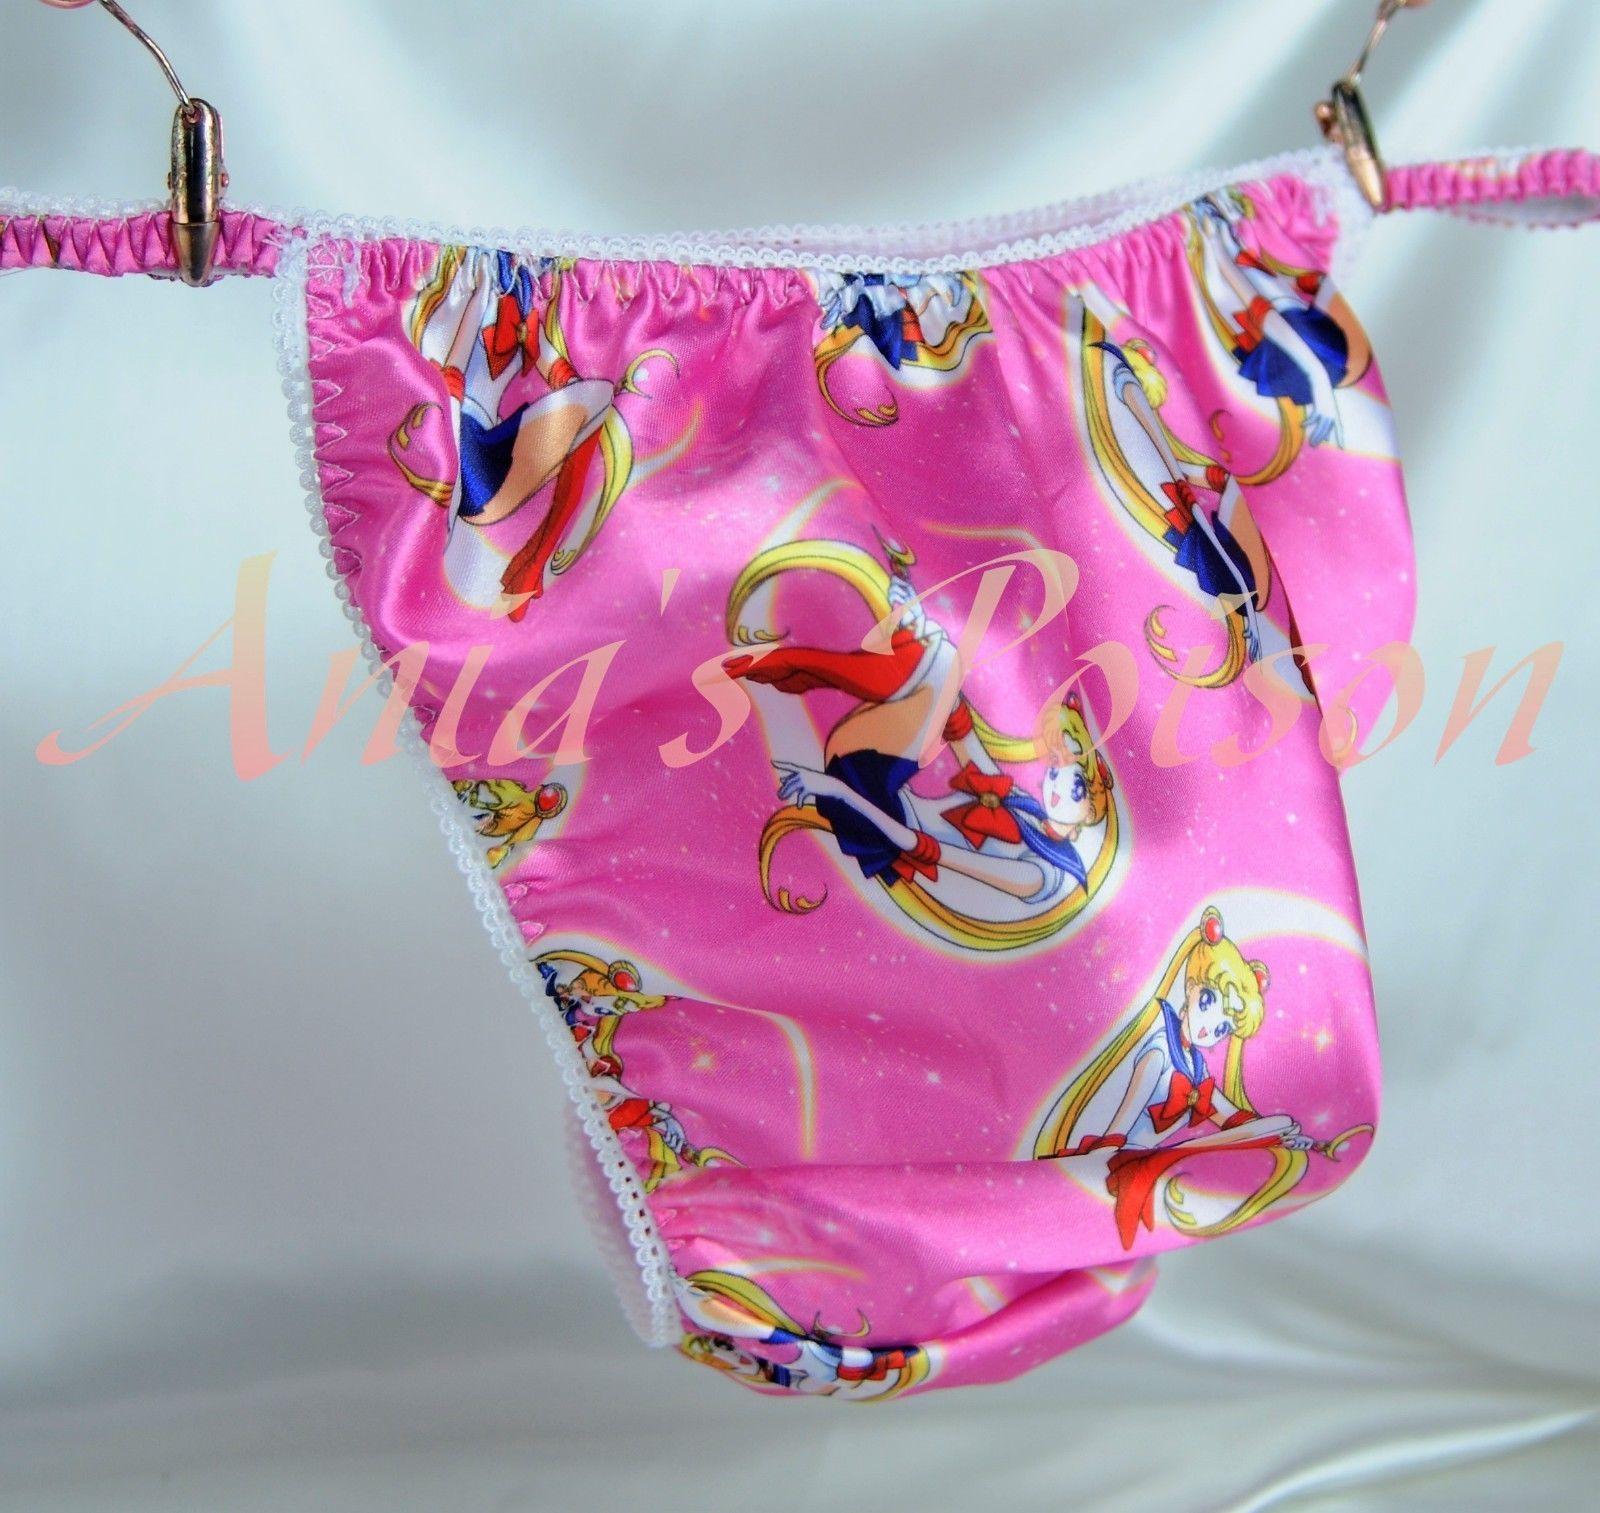 Ania's Poison Pink Sailor Moon Anime Print Super Rare 100% polyester SATIN string bikini sissy mens underwear panties